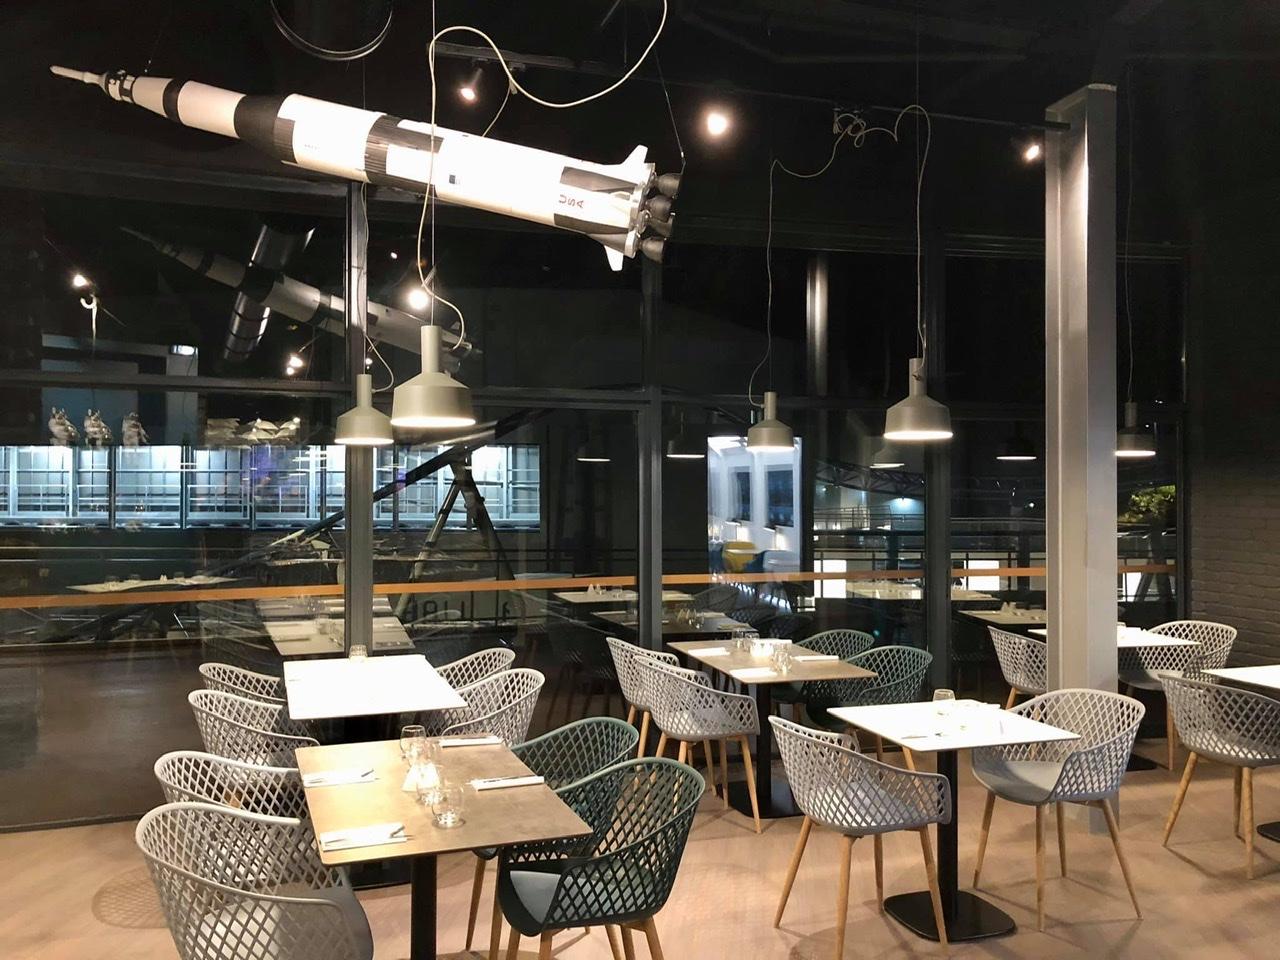 [Restaurant] L'Atelier des Saveurs · 2020 AC19218-D-E8-EC-4919-82-F4-EC5-F6-BF4-ED80